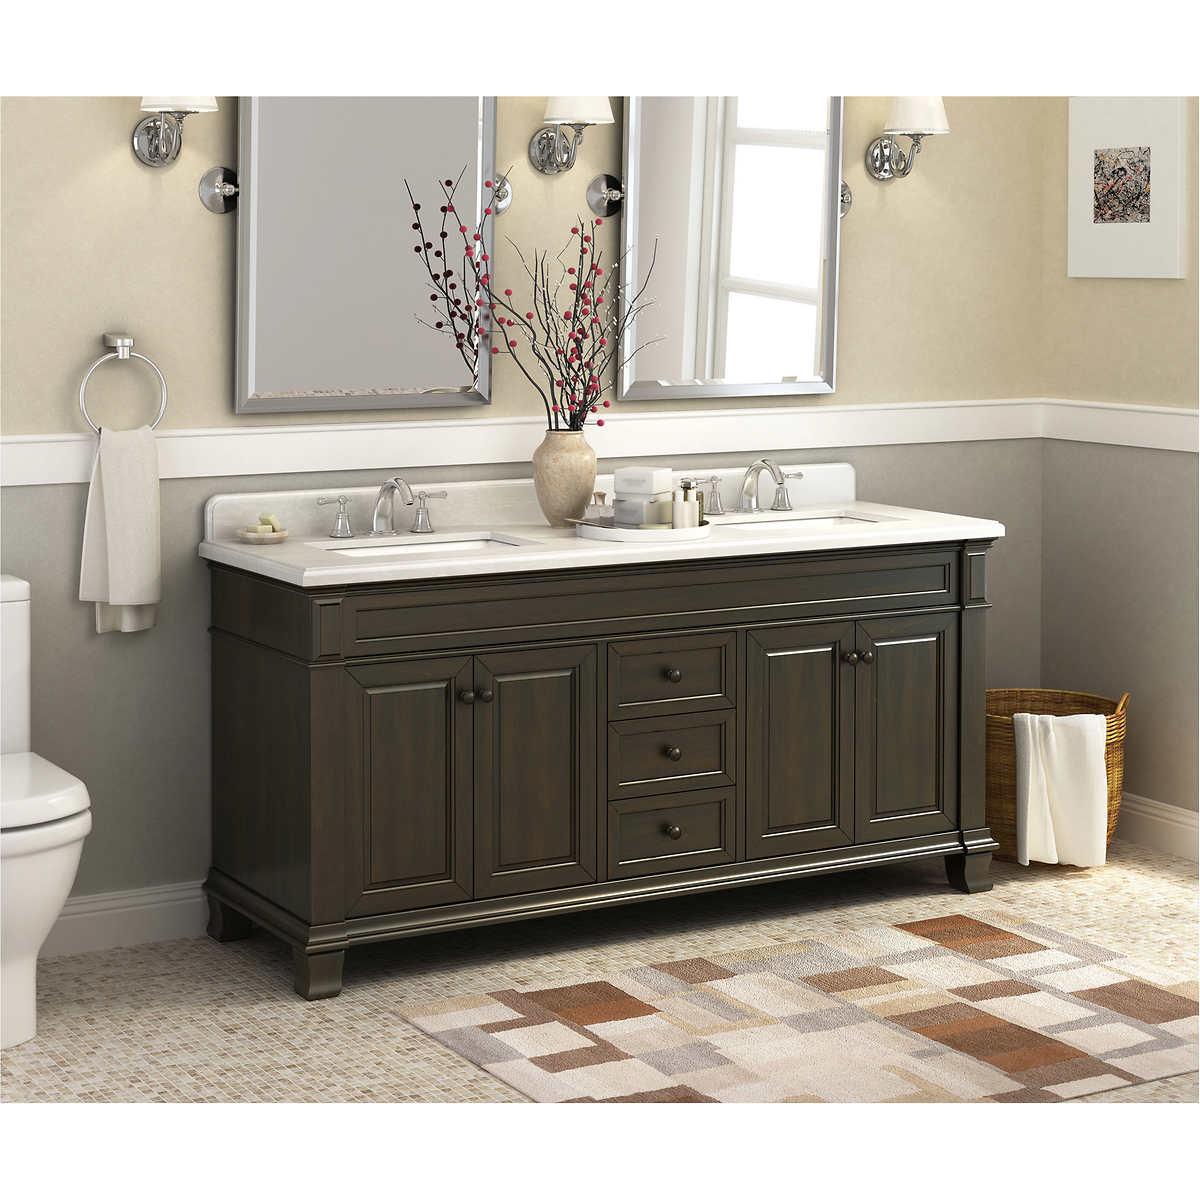 6 Foot Double Sink Bathroom Vanity